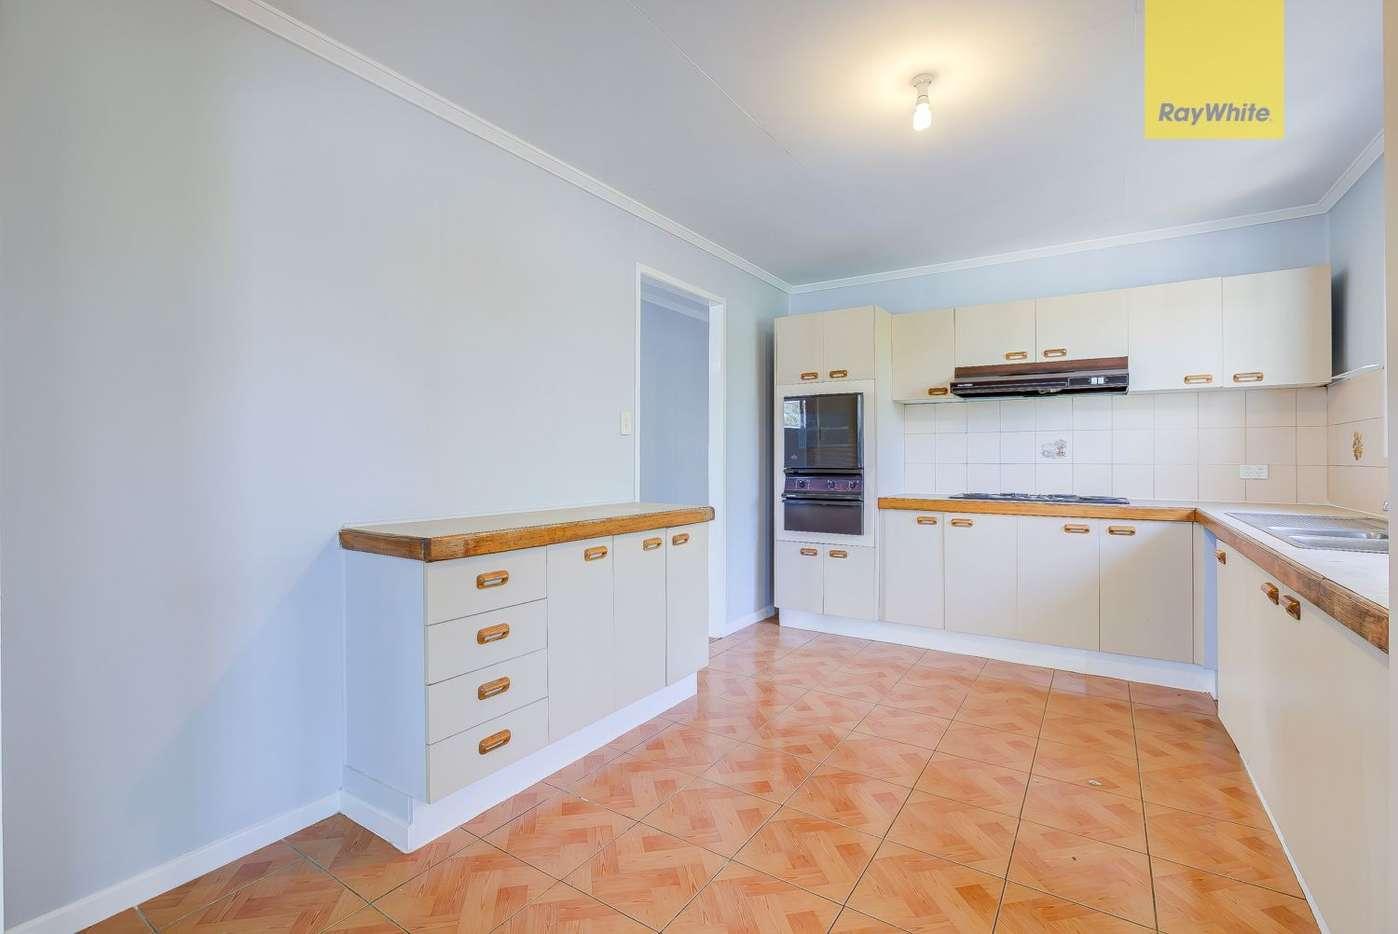 Main view of Homely house listing, 25 Defiance Road, Woodridge, QLD 4114